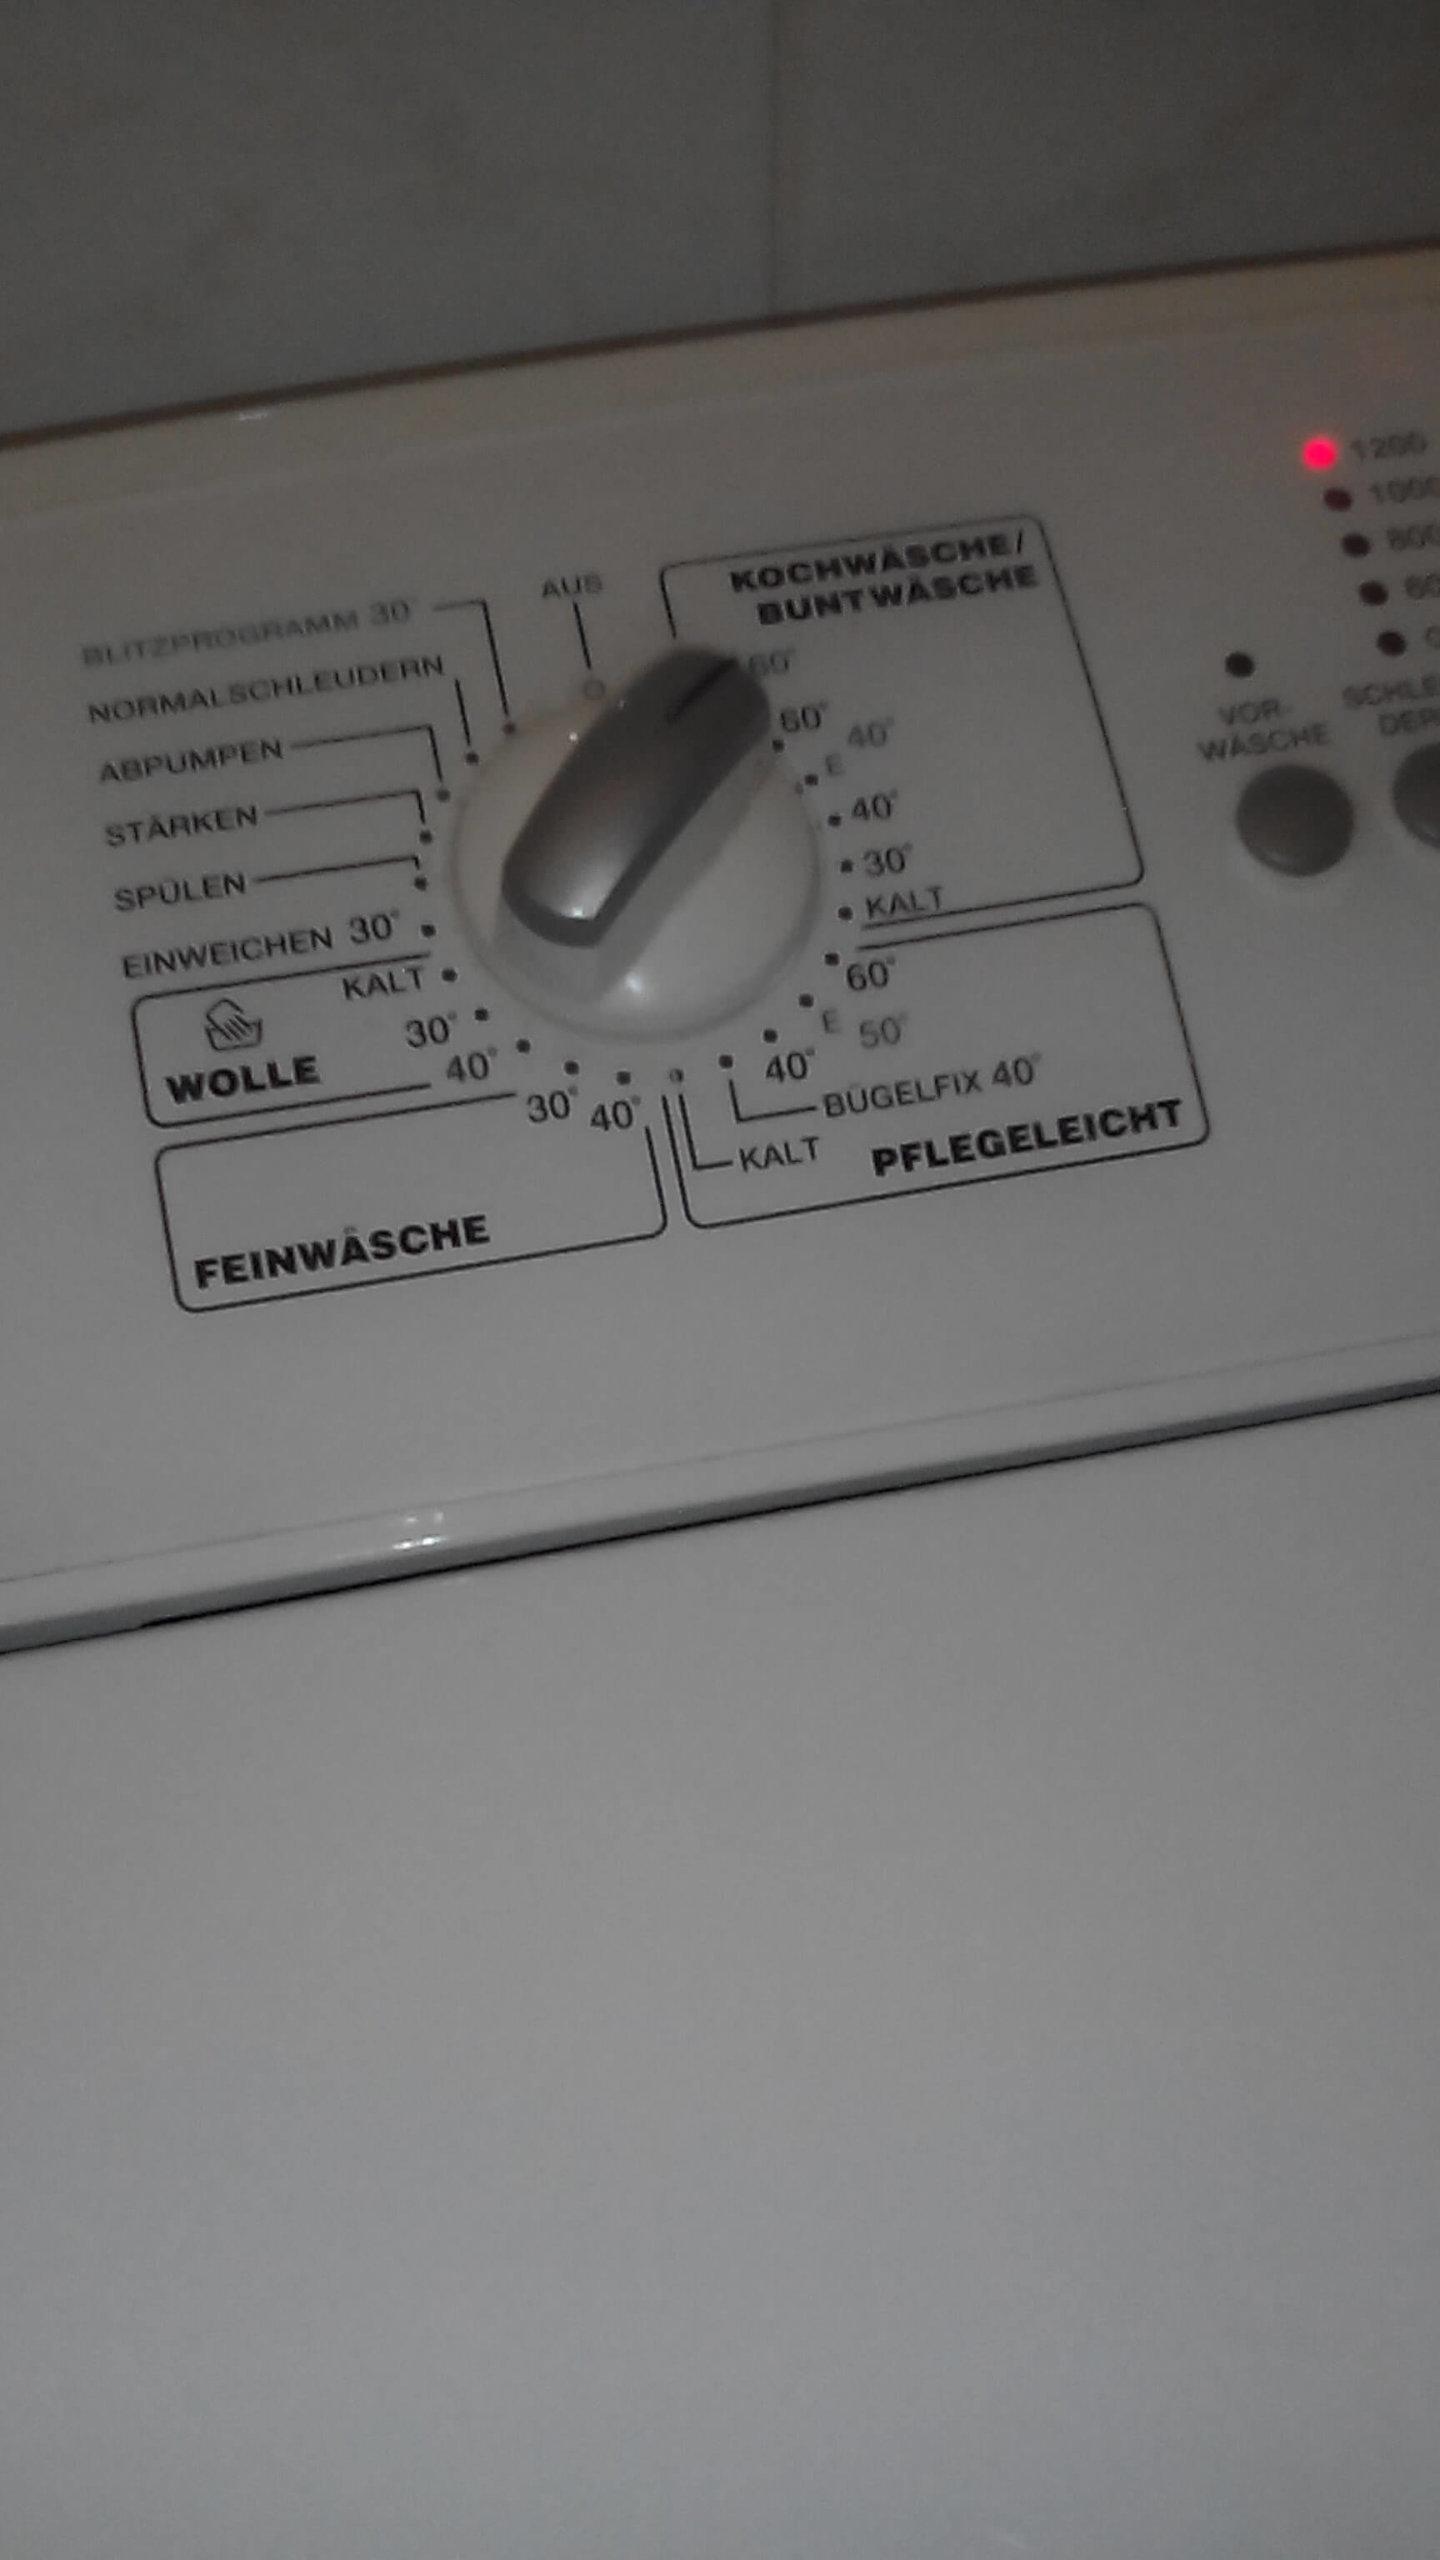 Waschmaschinenprogrammanzeige (c) familienfreund.de